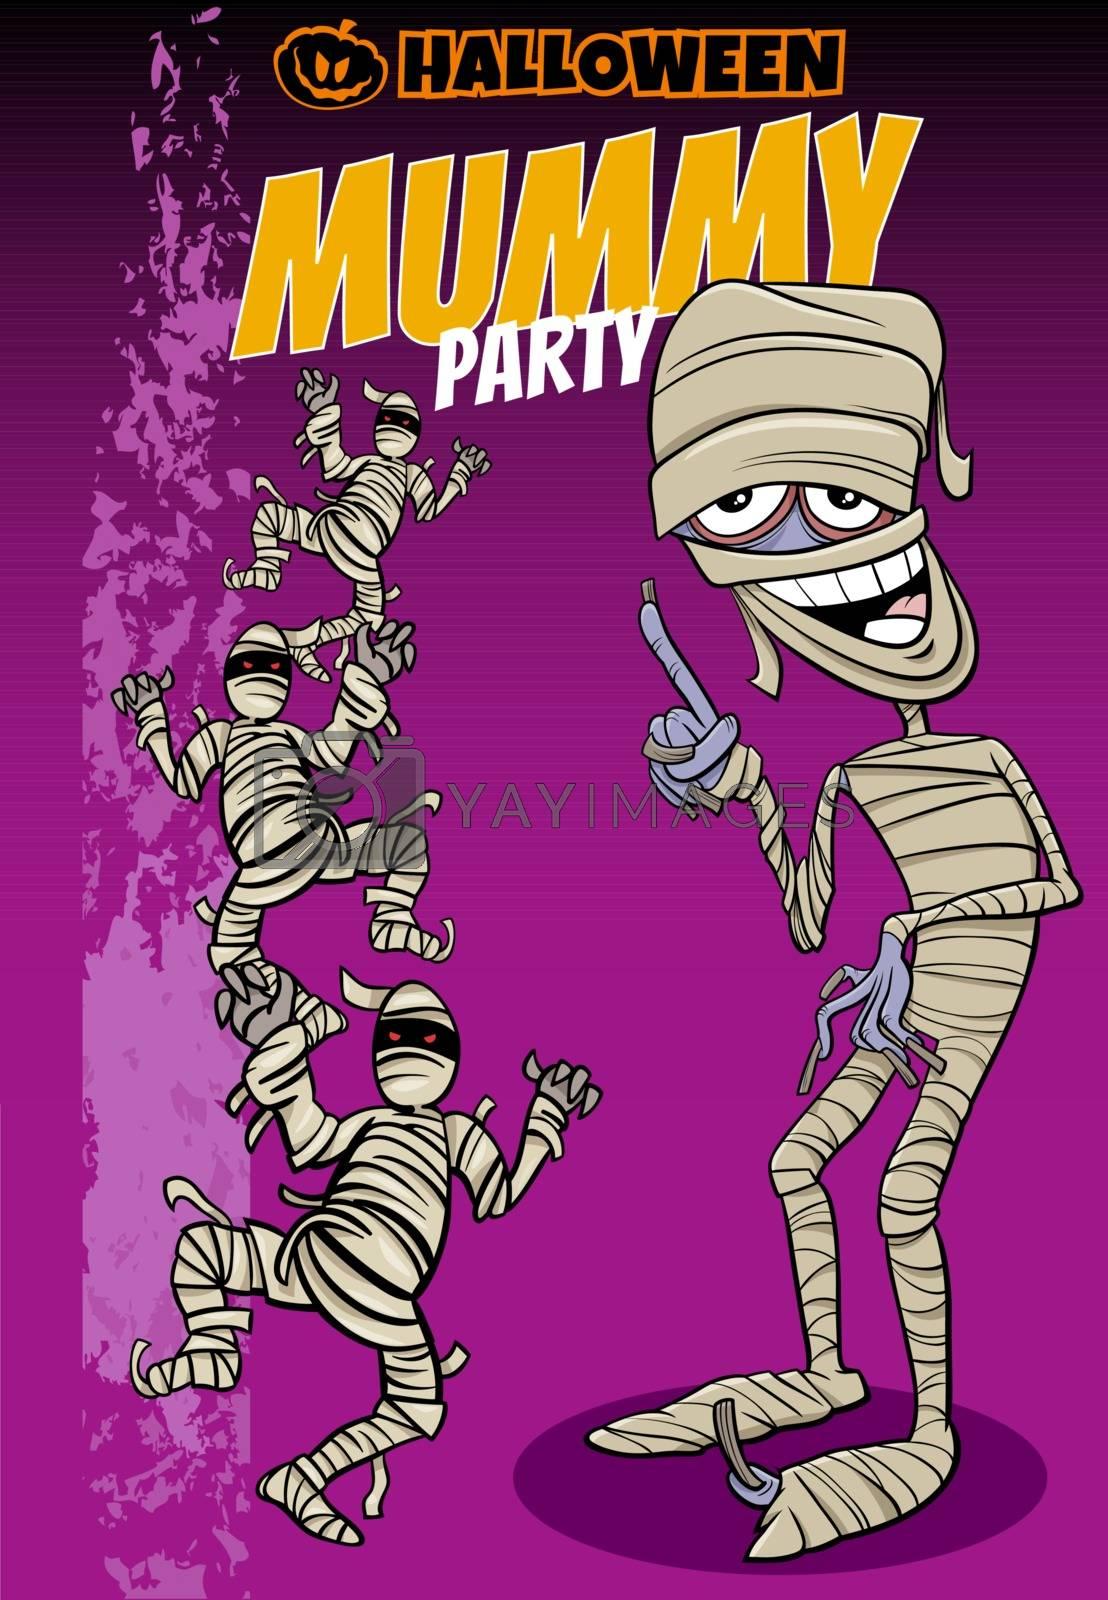 Cartoon Illustration of Halloween Holiday Mummy Party Poster or Invitation Design